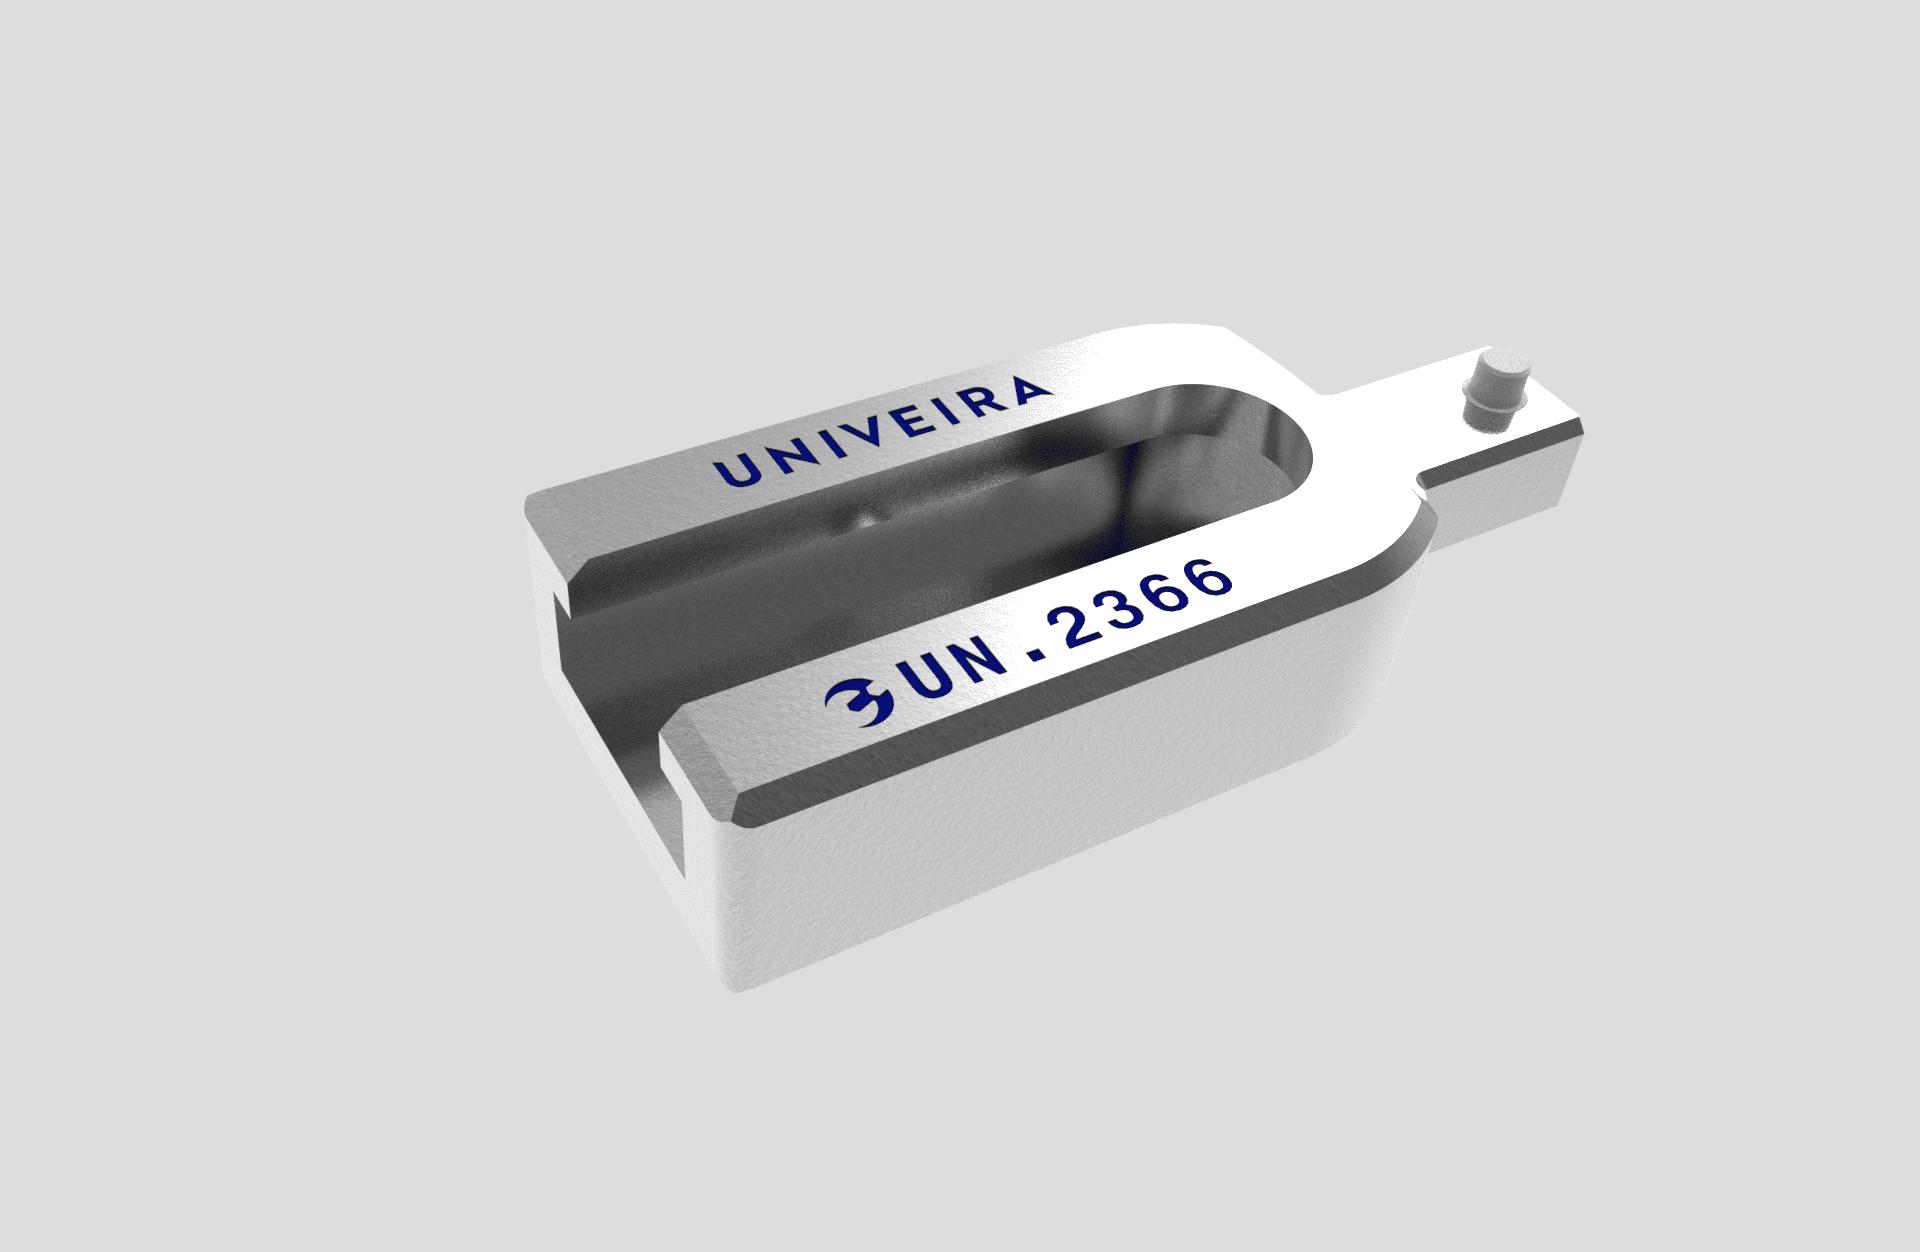 UN.2366 Adaptateur Mâle 9x12 - Femelle 20x7